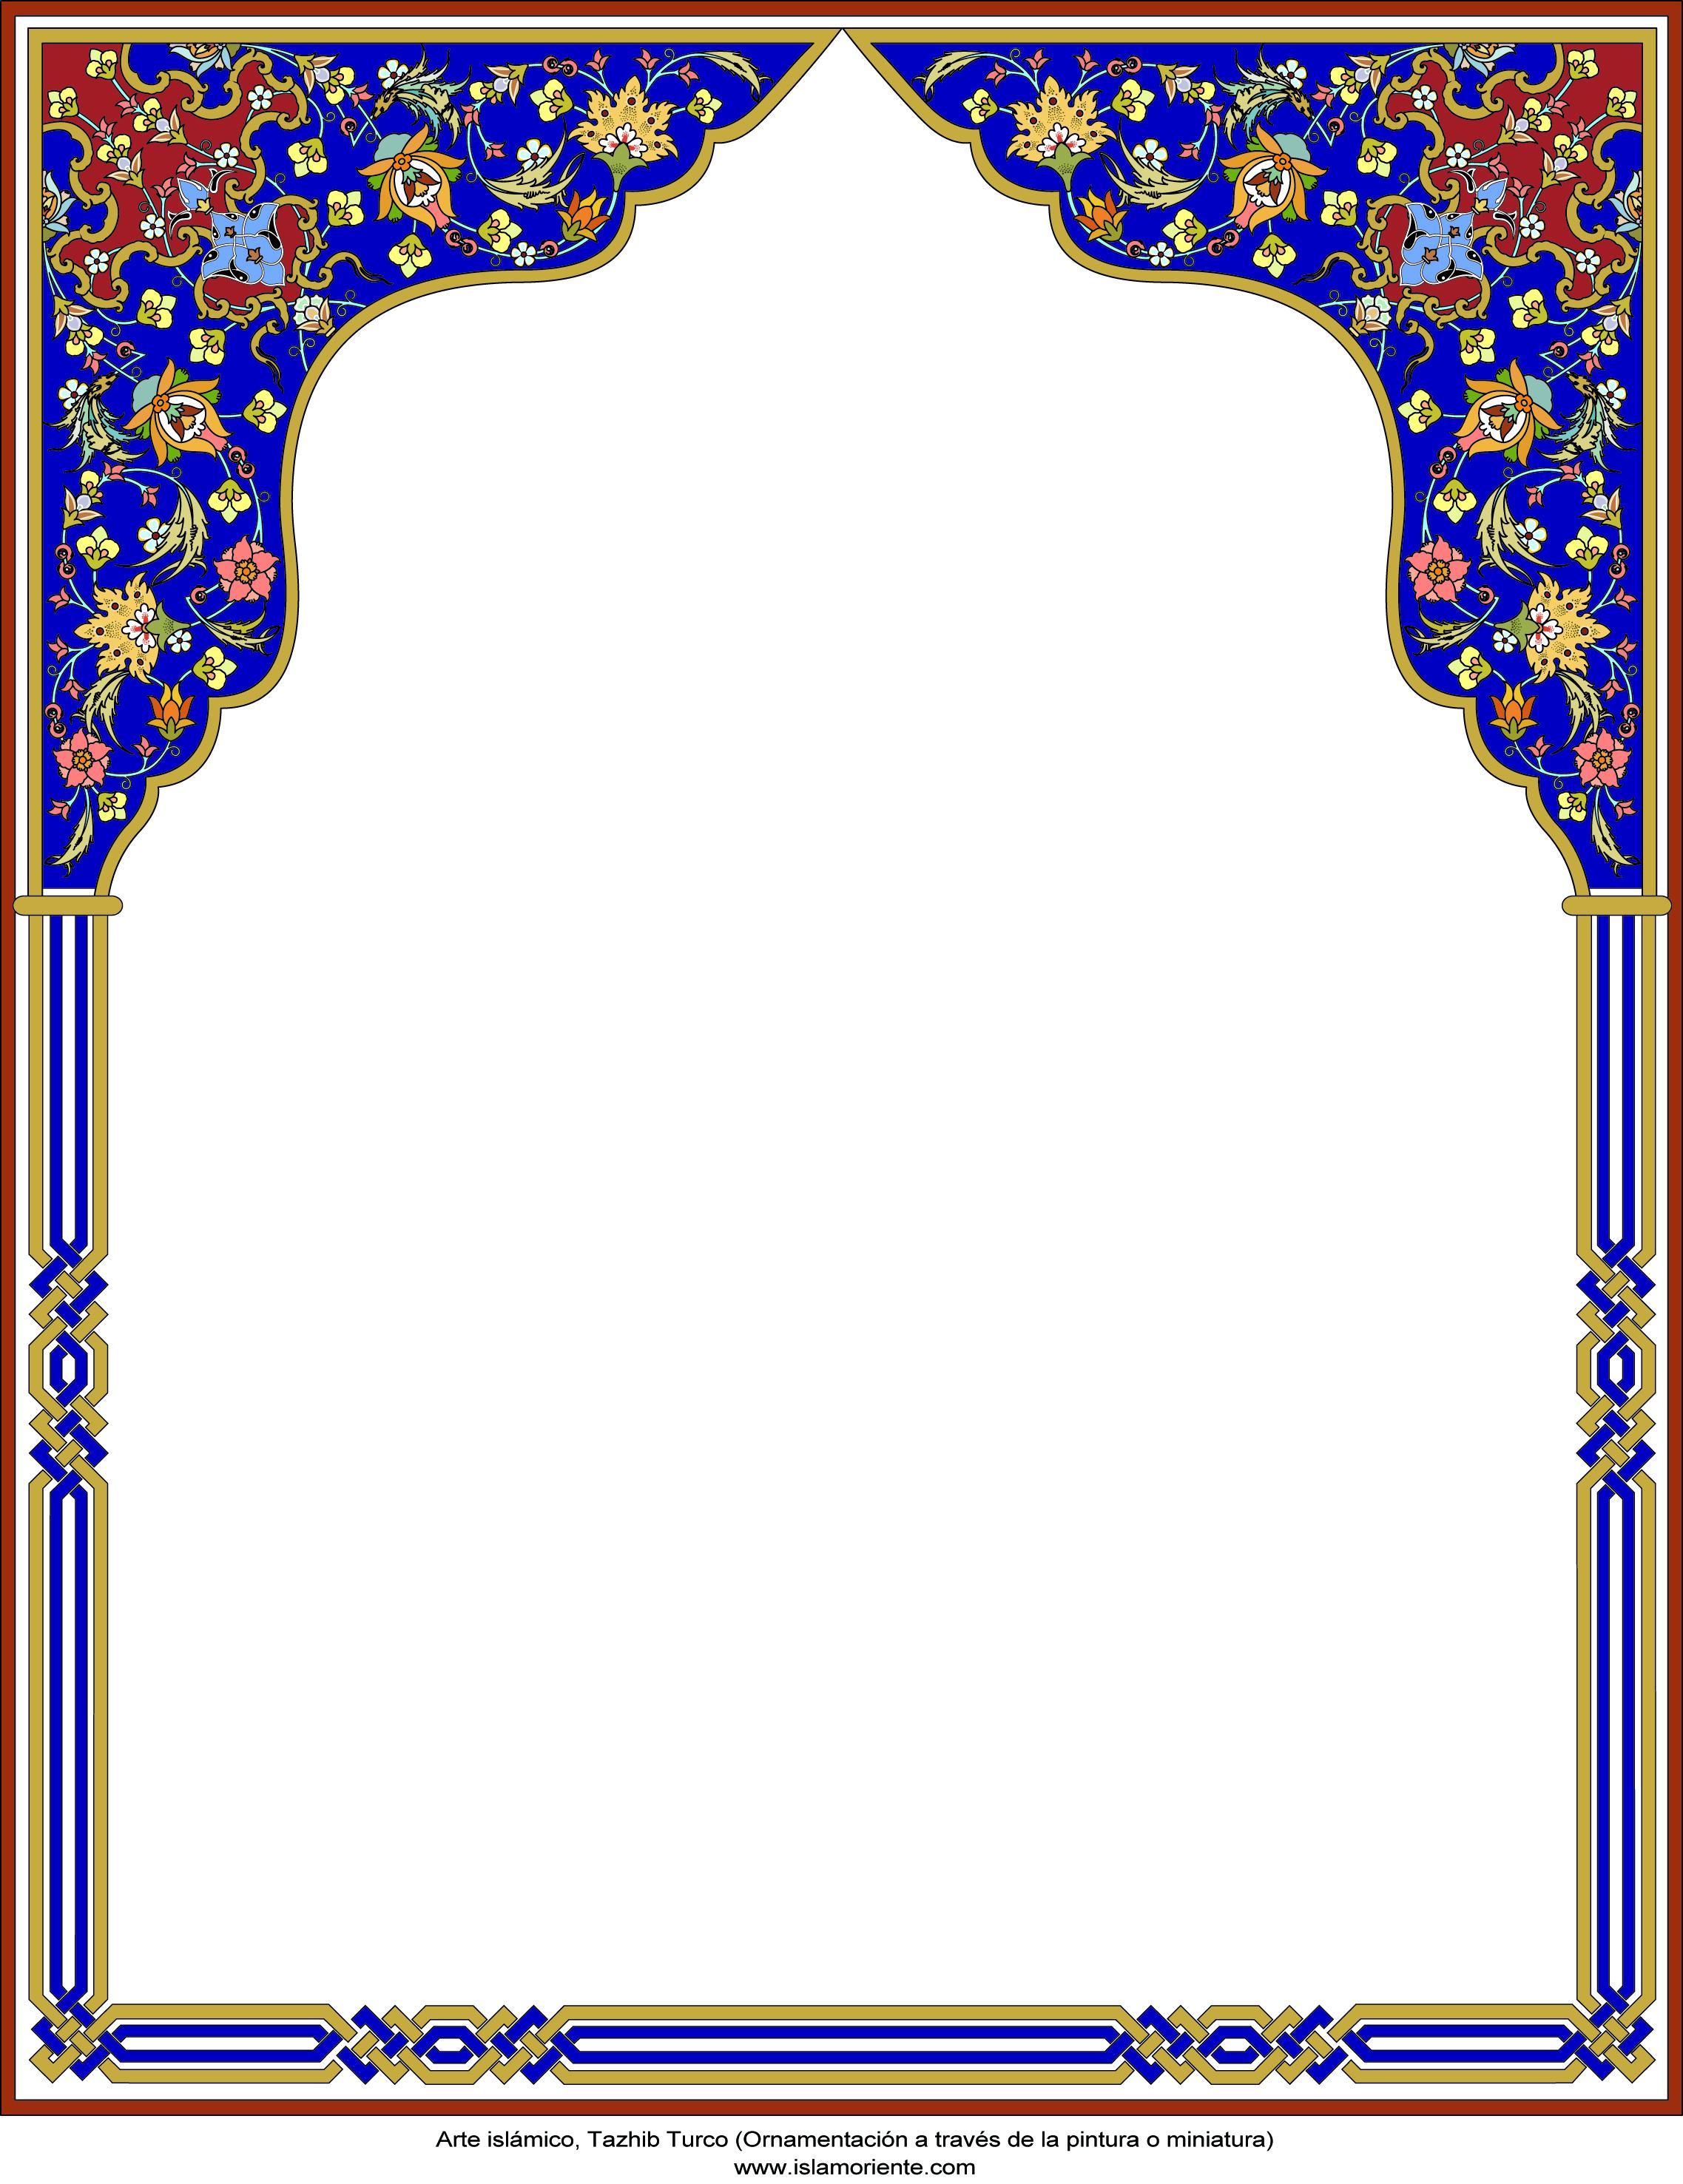 Islamic Art - Persian Tazhib - frame - 10 Gallery of Islamic Art and